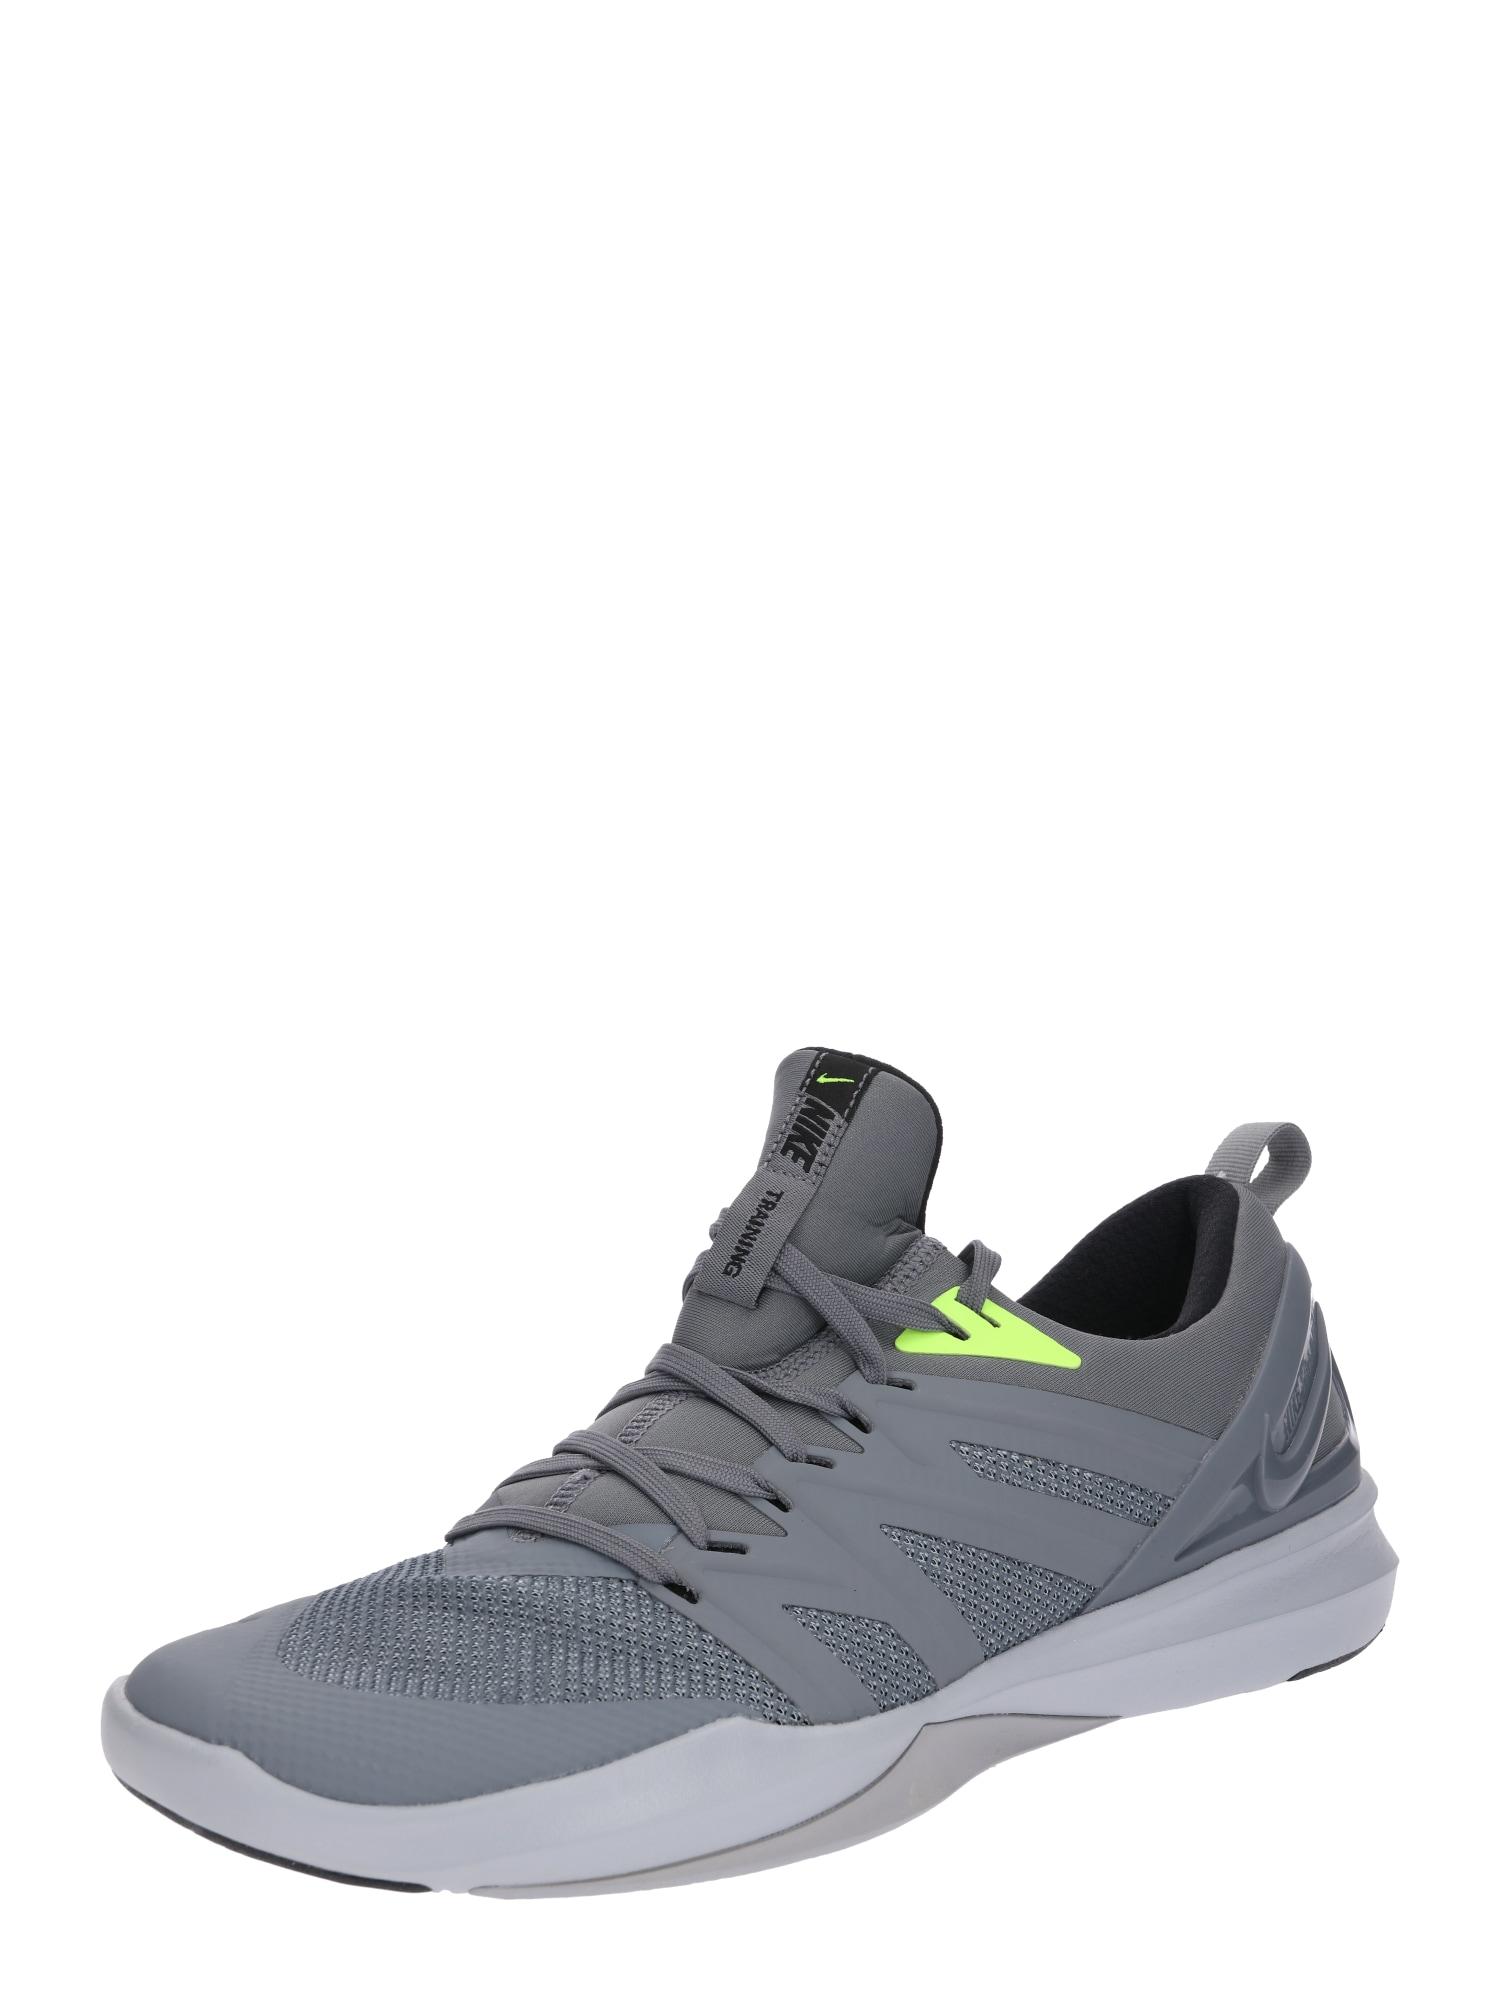 Sportovní boty Nike Victory Elite Trainer šedá NIKE